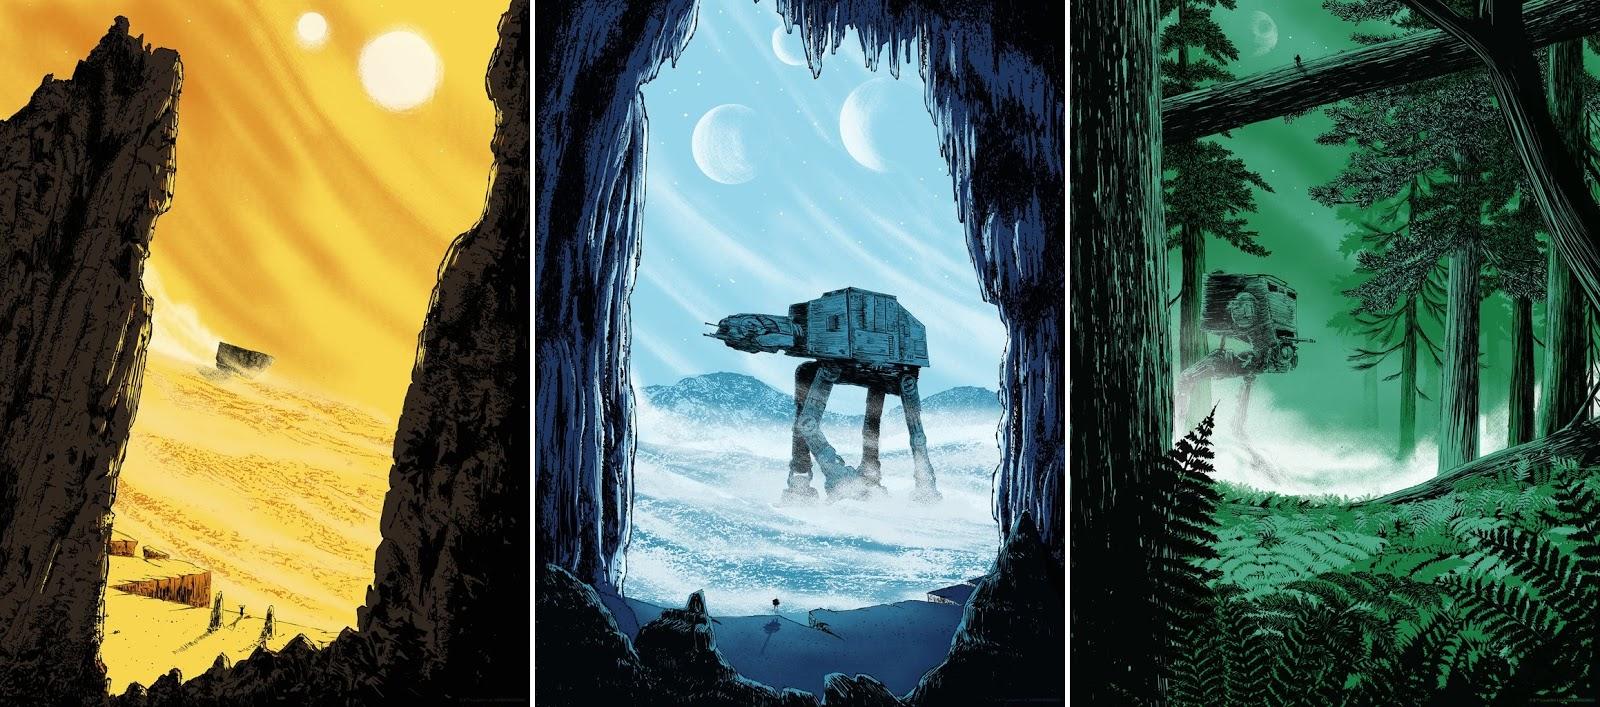 sale retailer ec7ce c72a7 Star Wars  The Original Trilogy Screen Prints by Matt Saunders x Bottleneck  Gallery